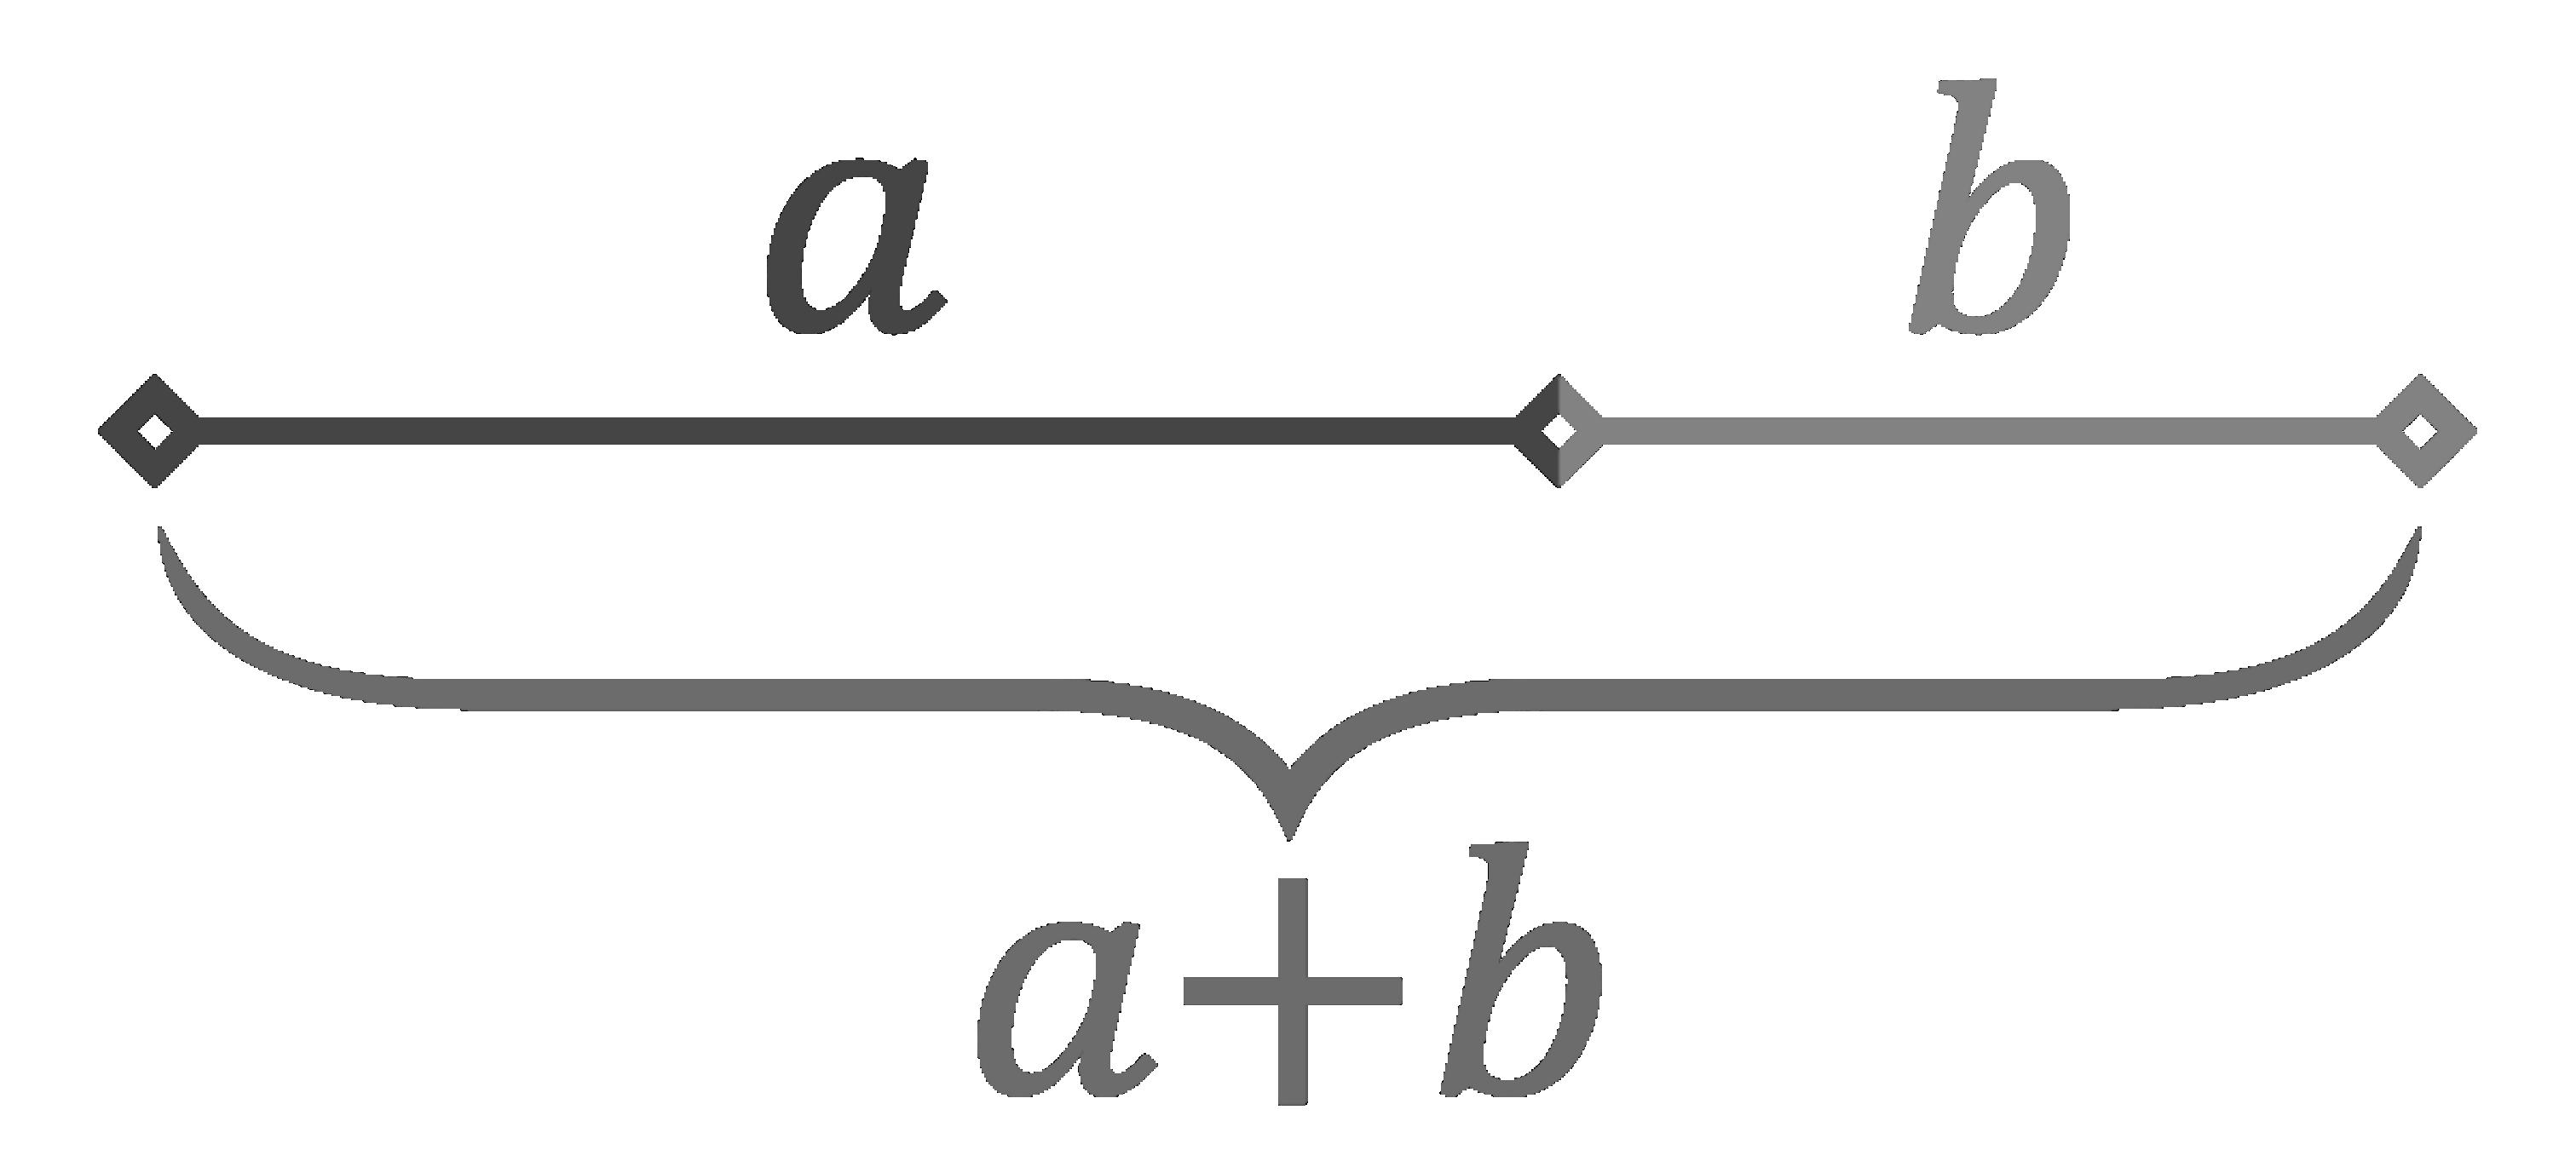 day-so-fibonacci-la-gi-huong-dan-cach-su-dung-hieu-qua-2